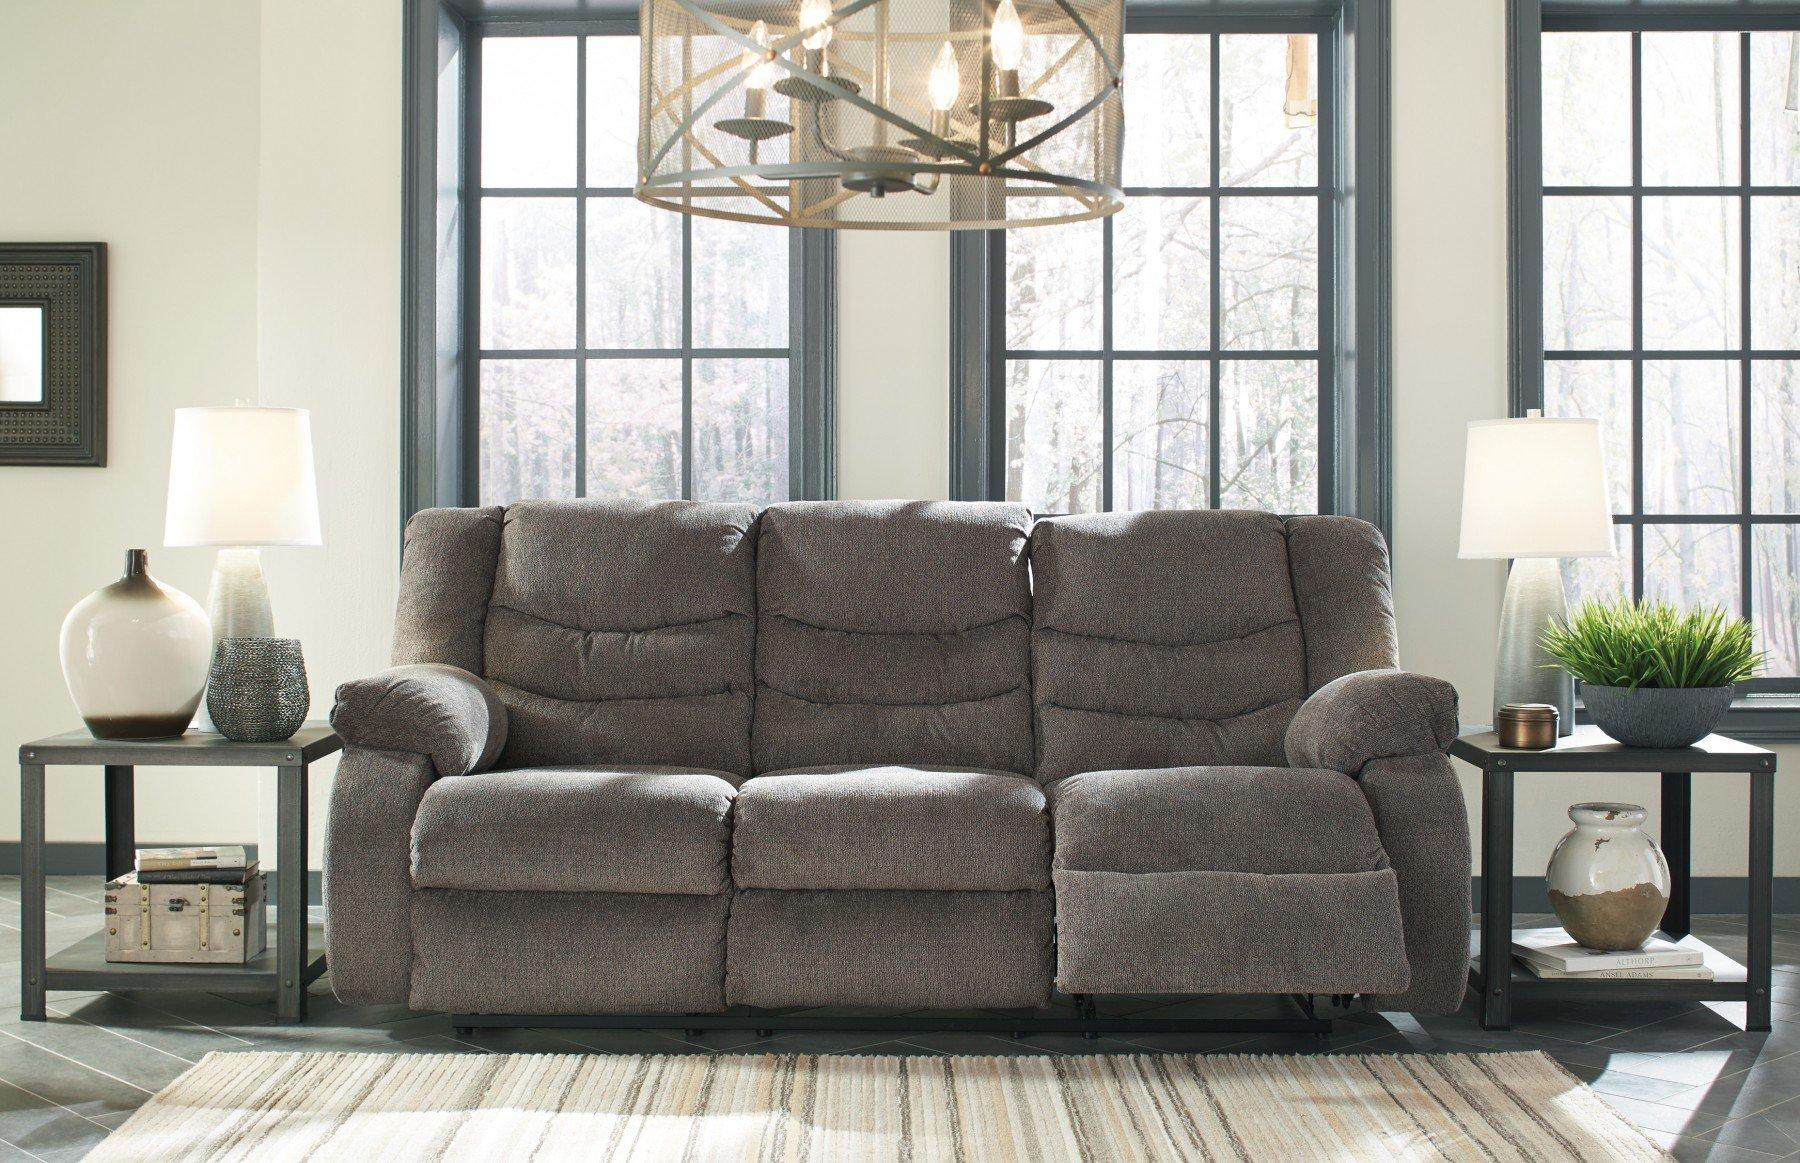 Tulen Gray Reclining Sofa by Ashley Furniture